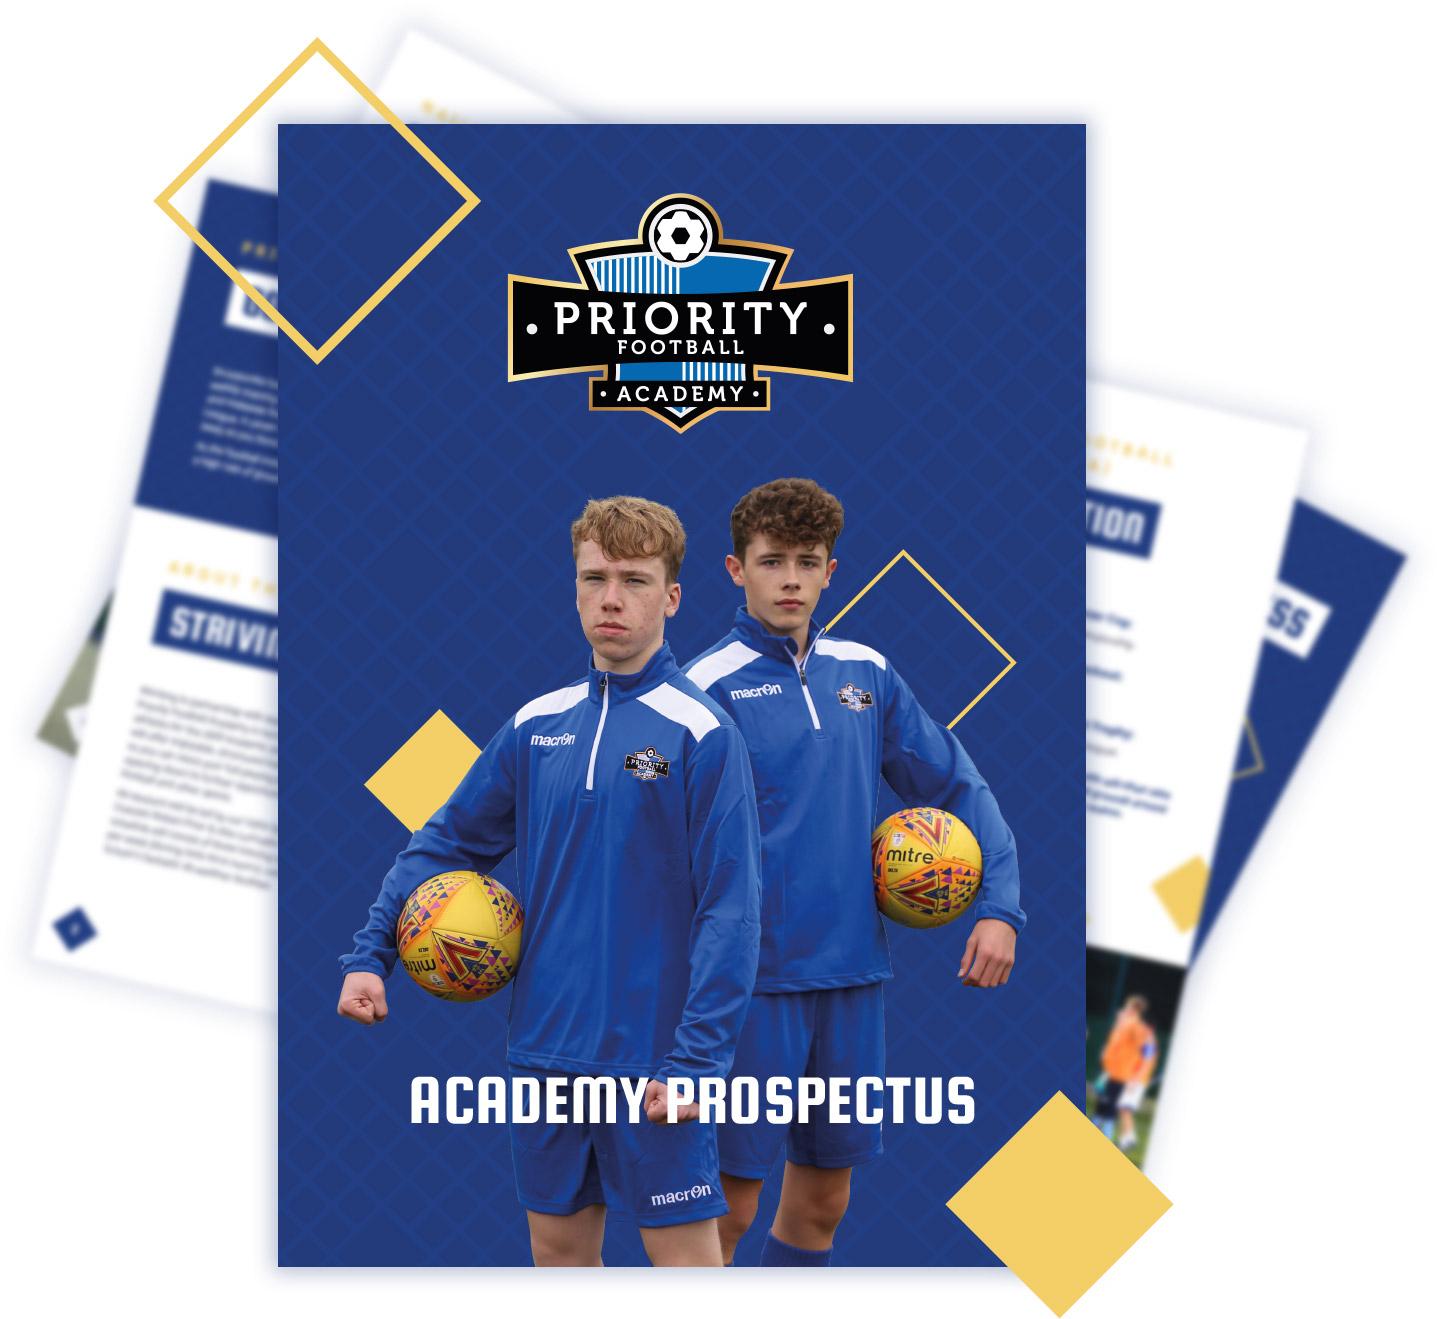 Prospectus Image